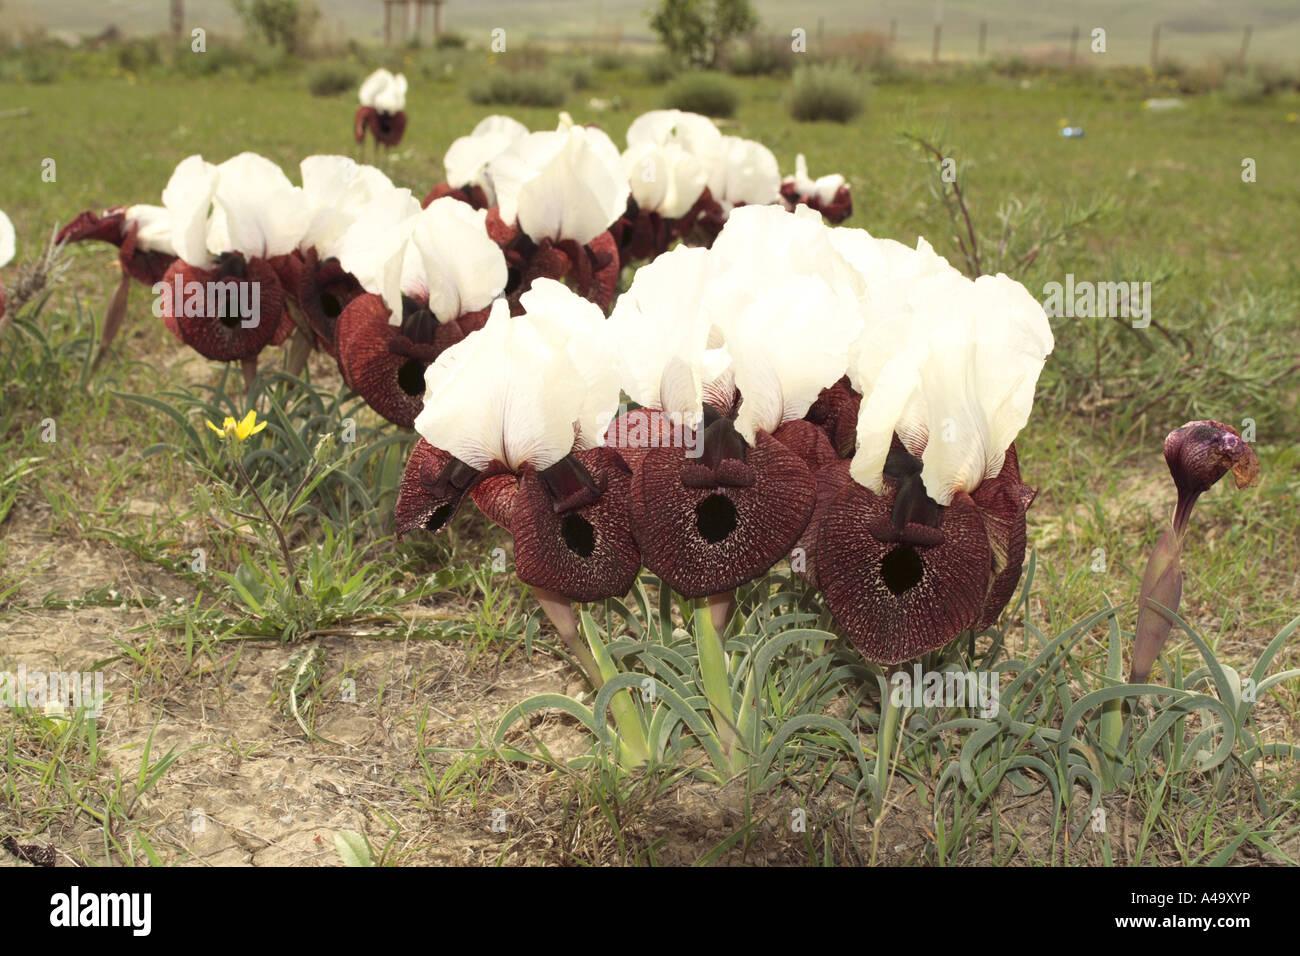 bearded iris (Iris elegantissima, Iris iberica ssp. elegantissima), group of blooming plants, Turkey, East Anatolia, Stock Photo